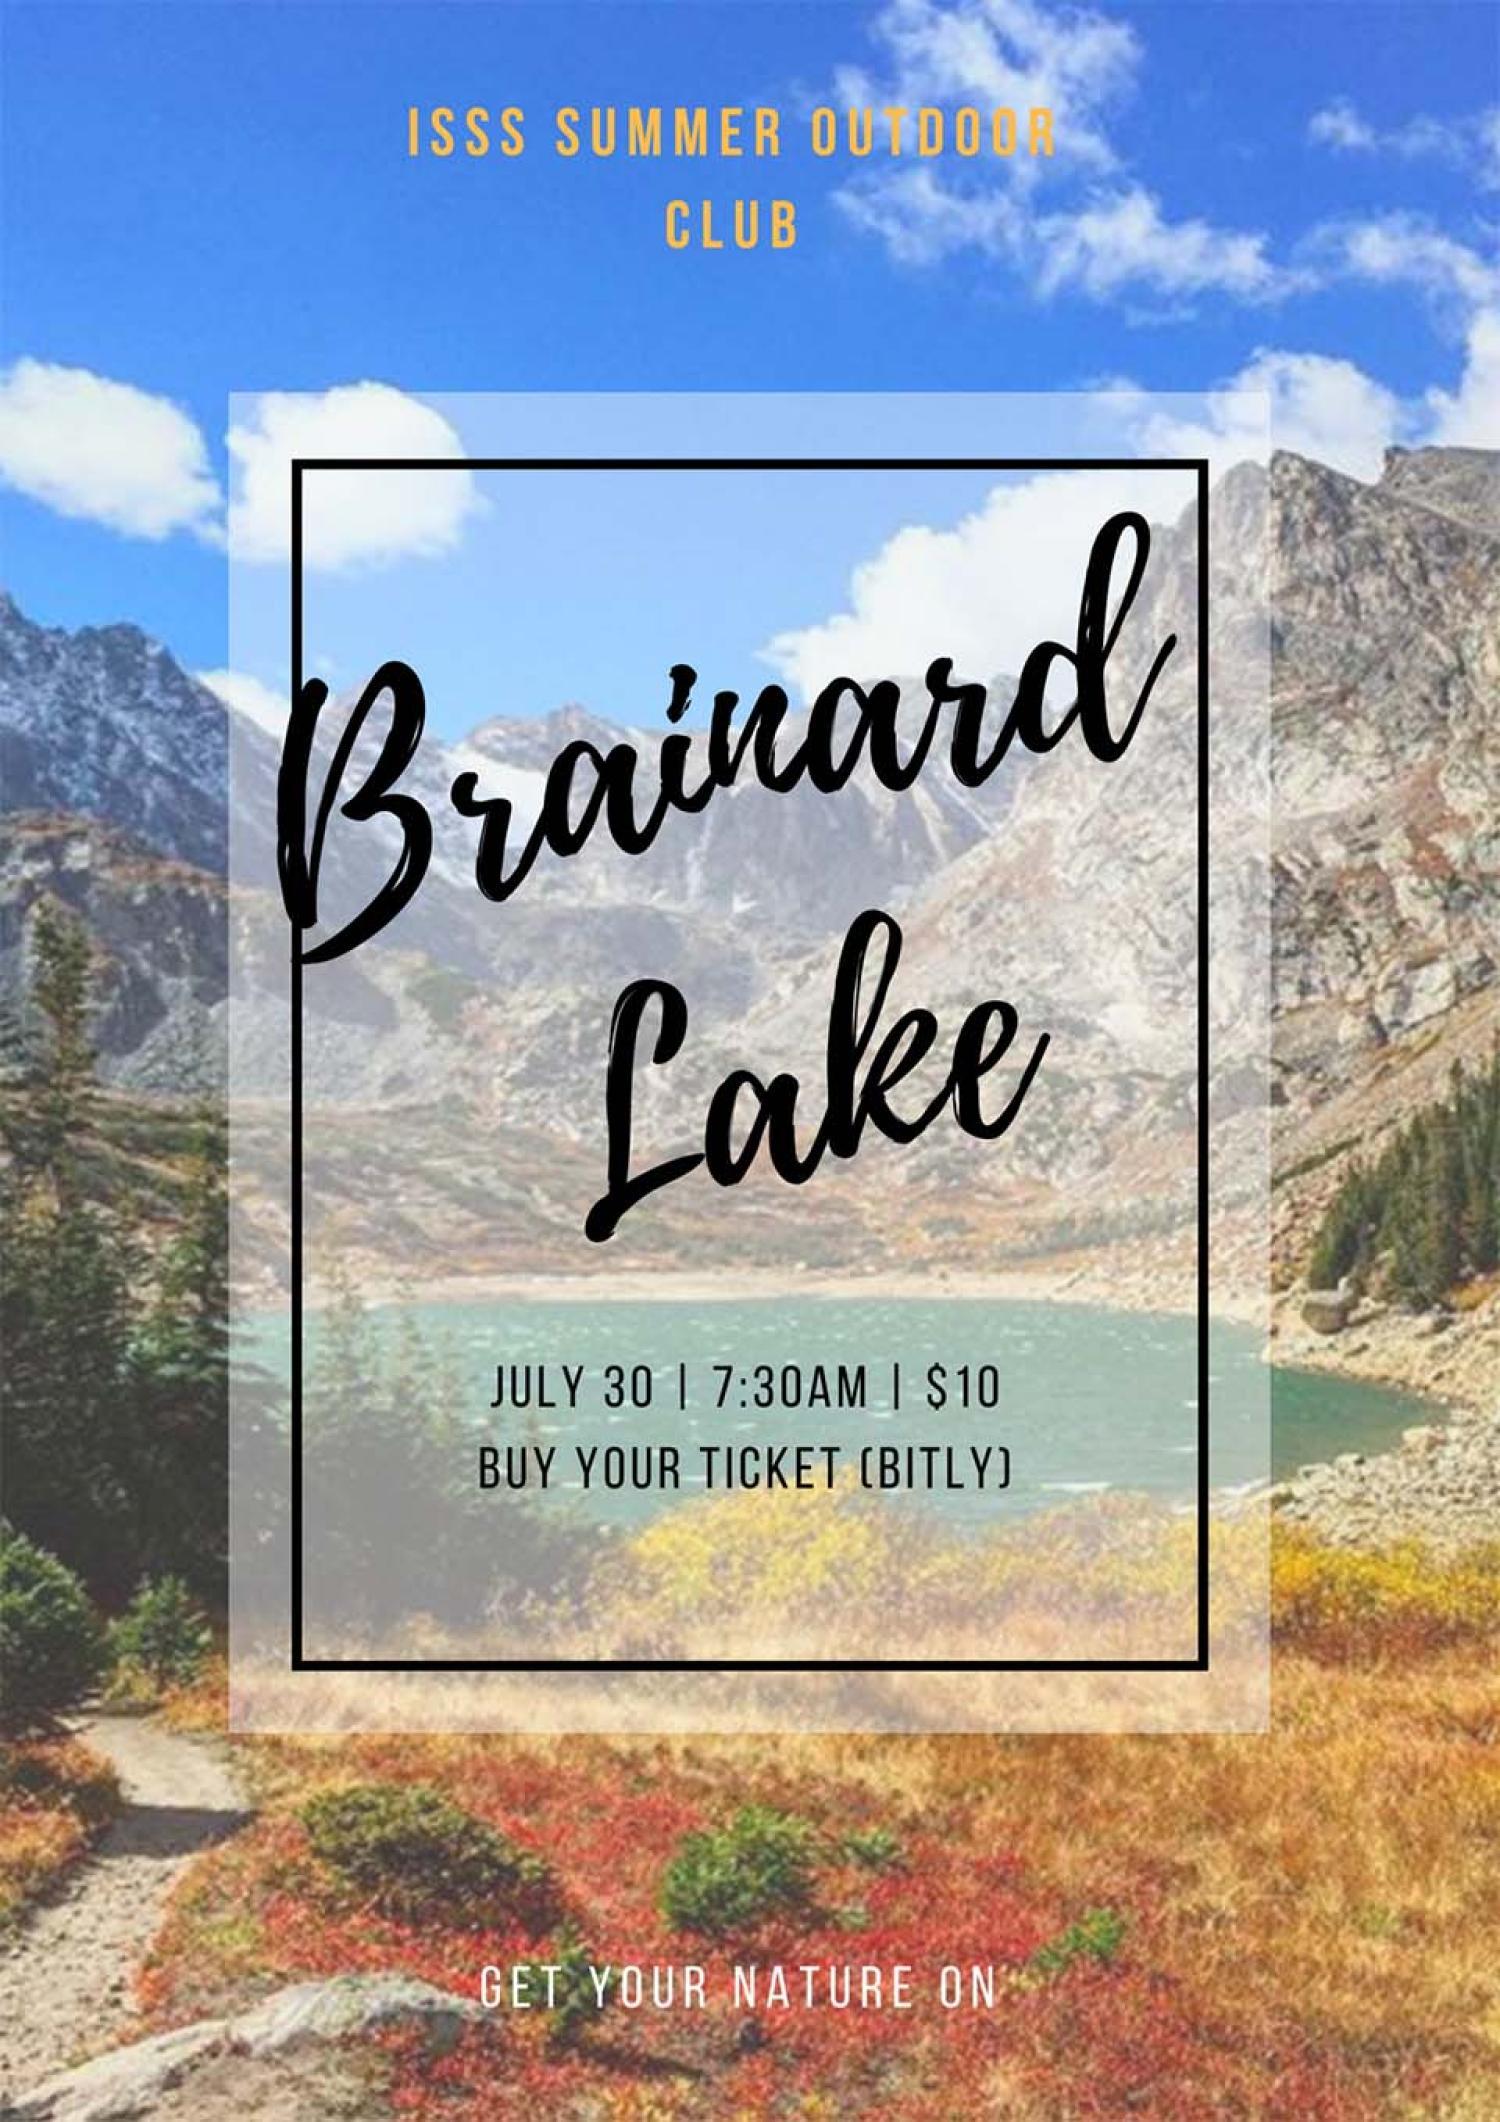 Brainard Lake Event Flyer